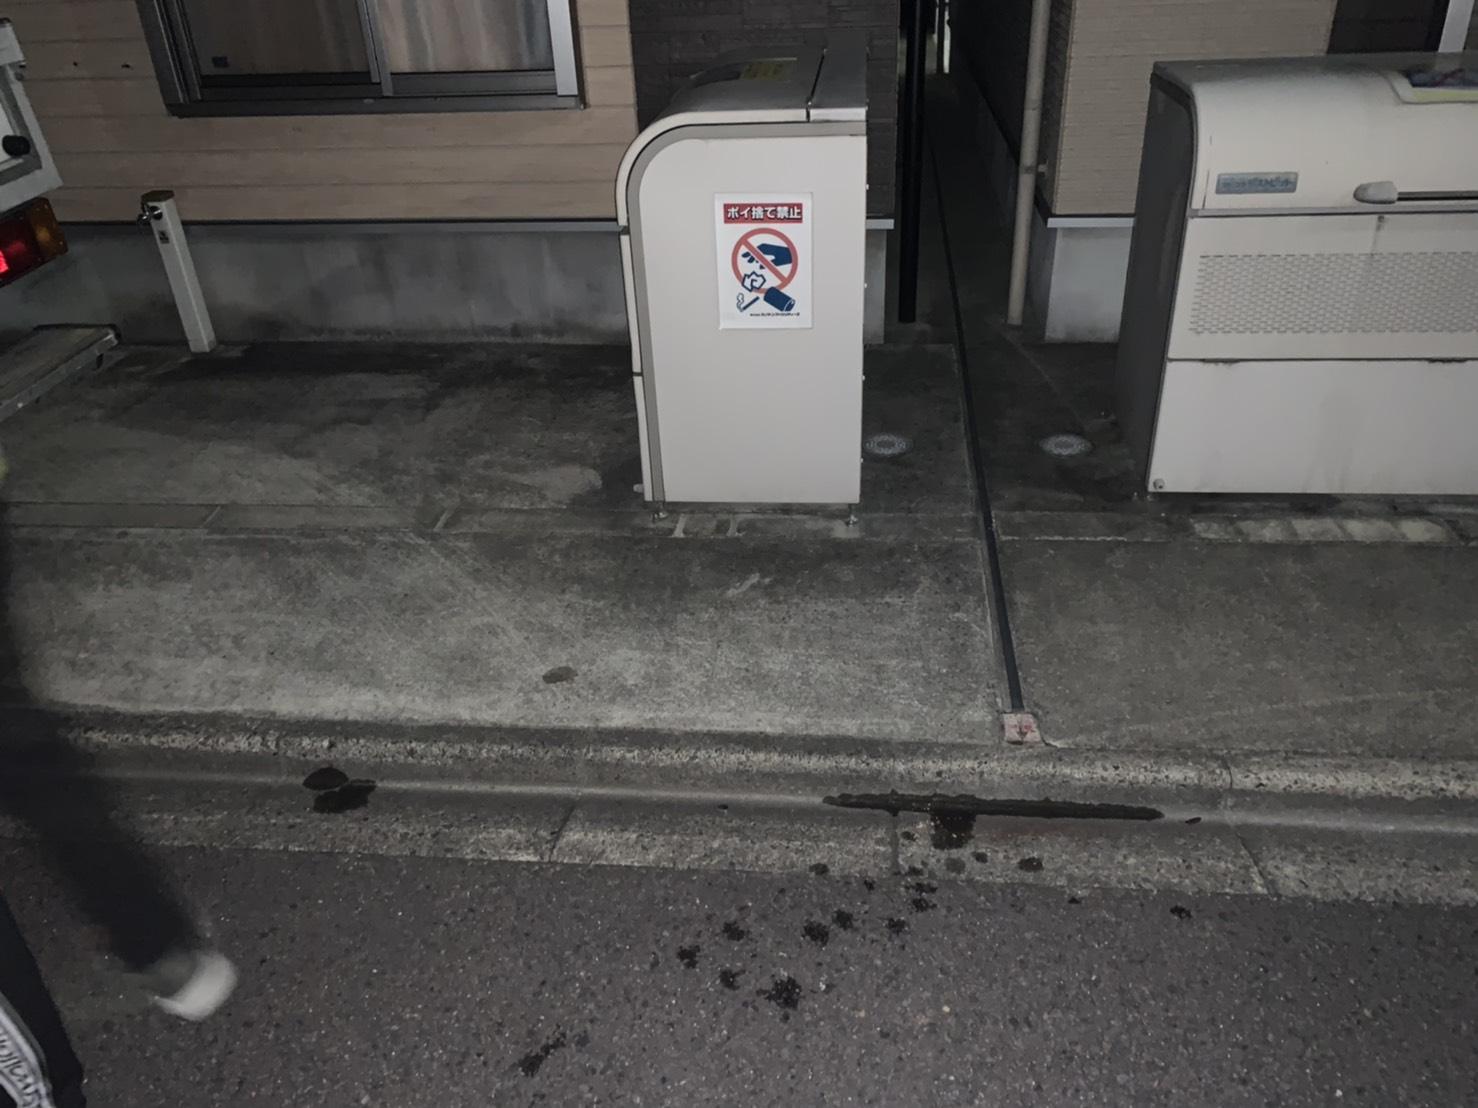 洗濯機、冷蔵庫、空気清浄機、乗馬、炊飯器、電子レンジの回収後